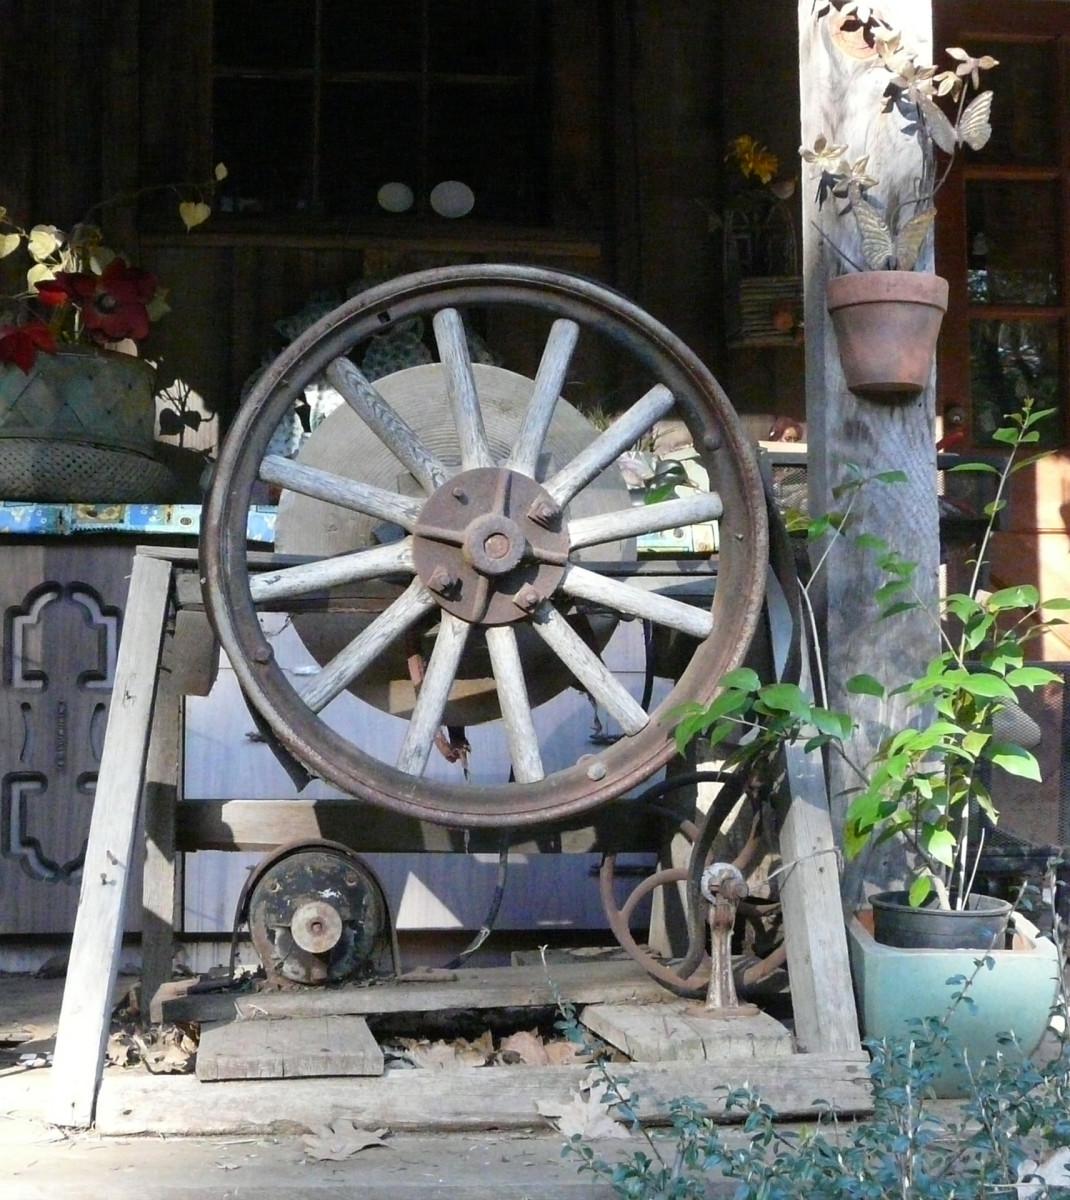 Wagon Wheel grinding wheel